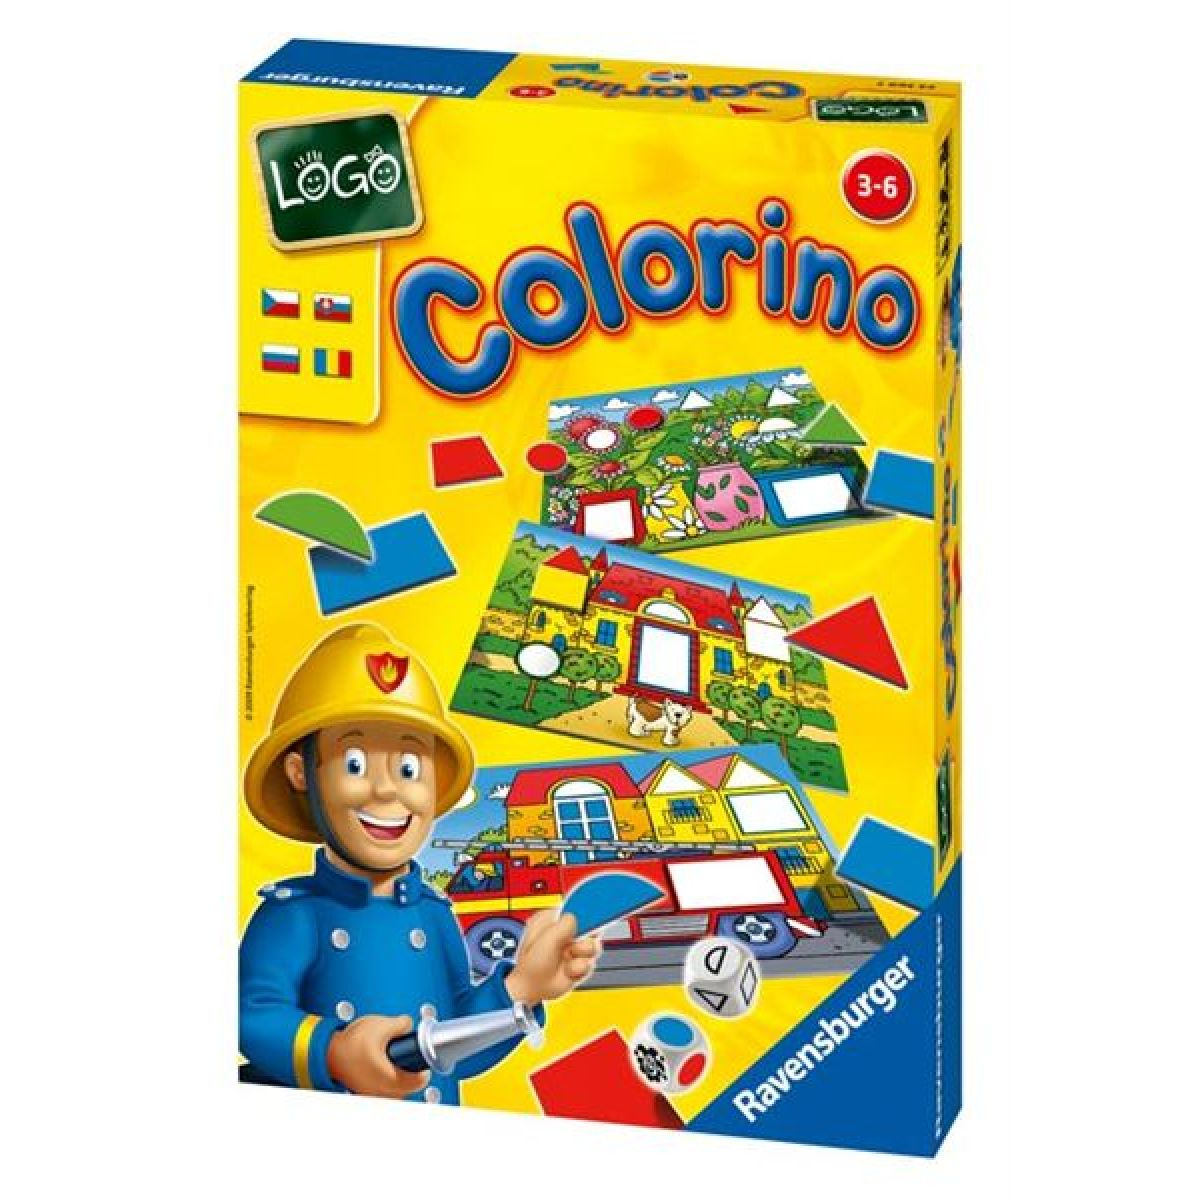 Ravensburger 24369 - LOGO Colorino